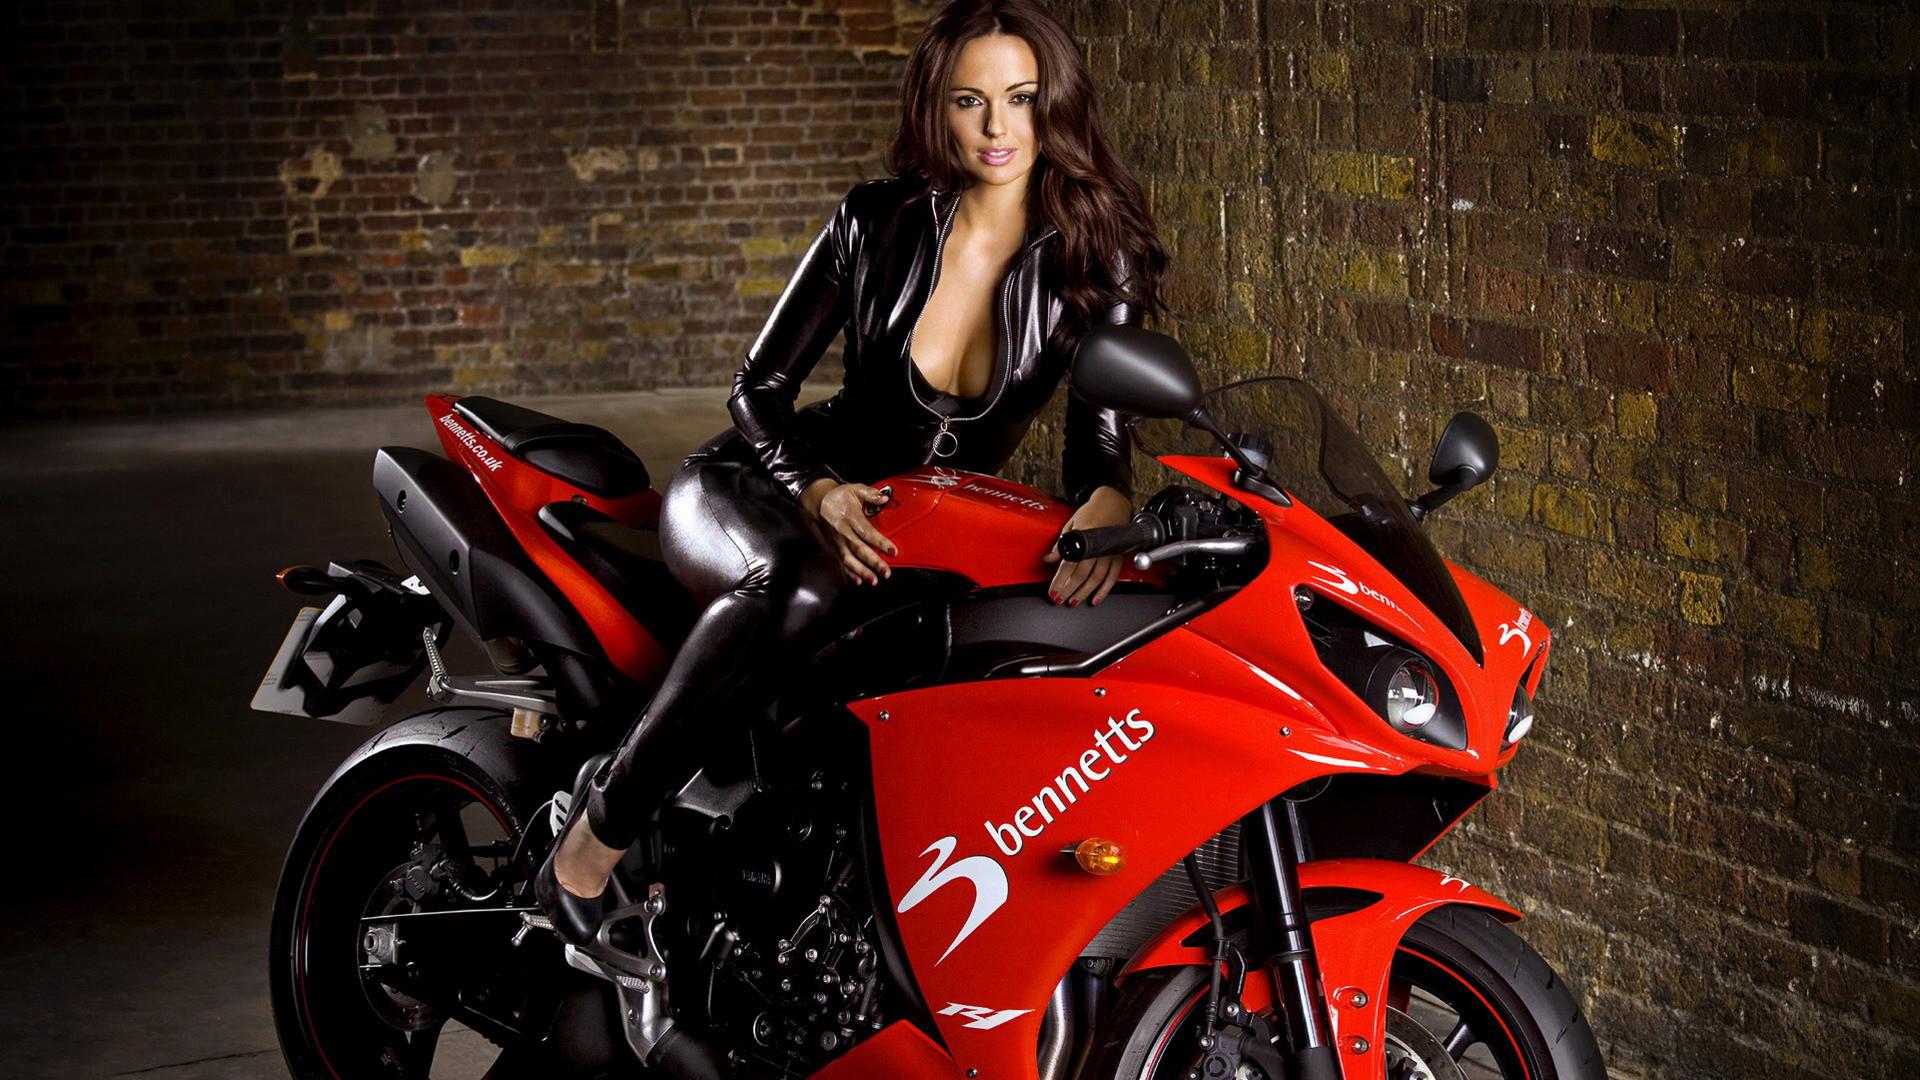 Motorcycles Hot Girl on Bike